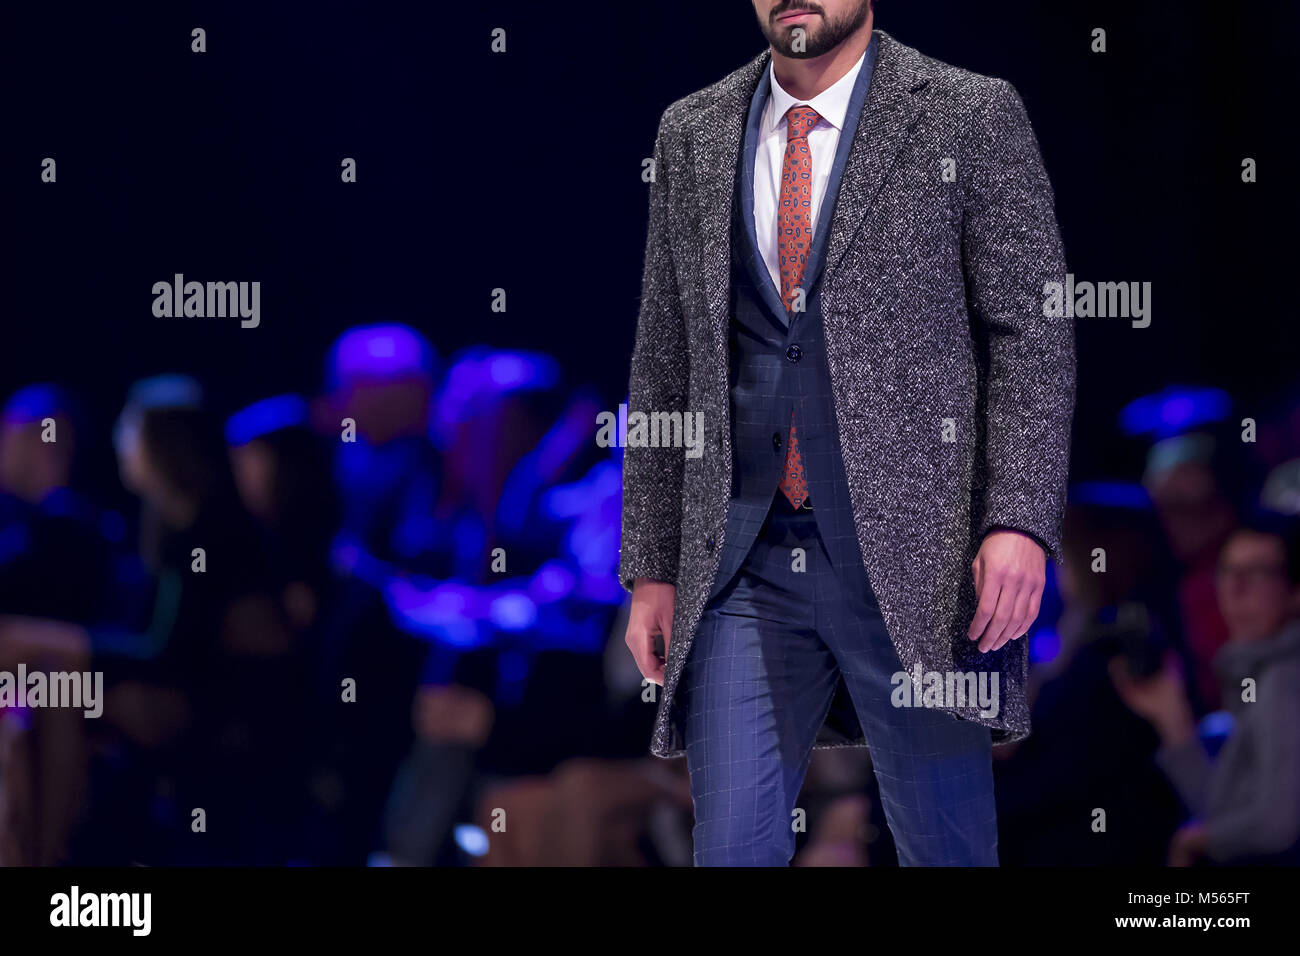 Fashion catwalk runway show models - Stock Image